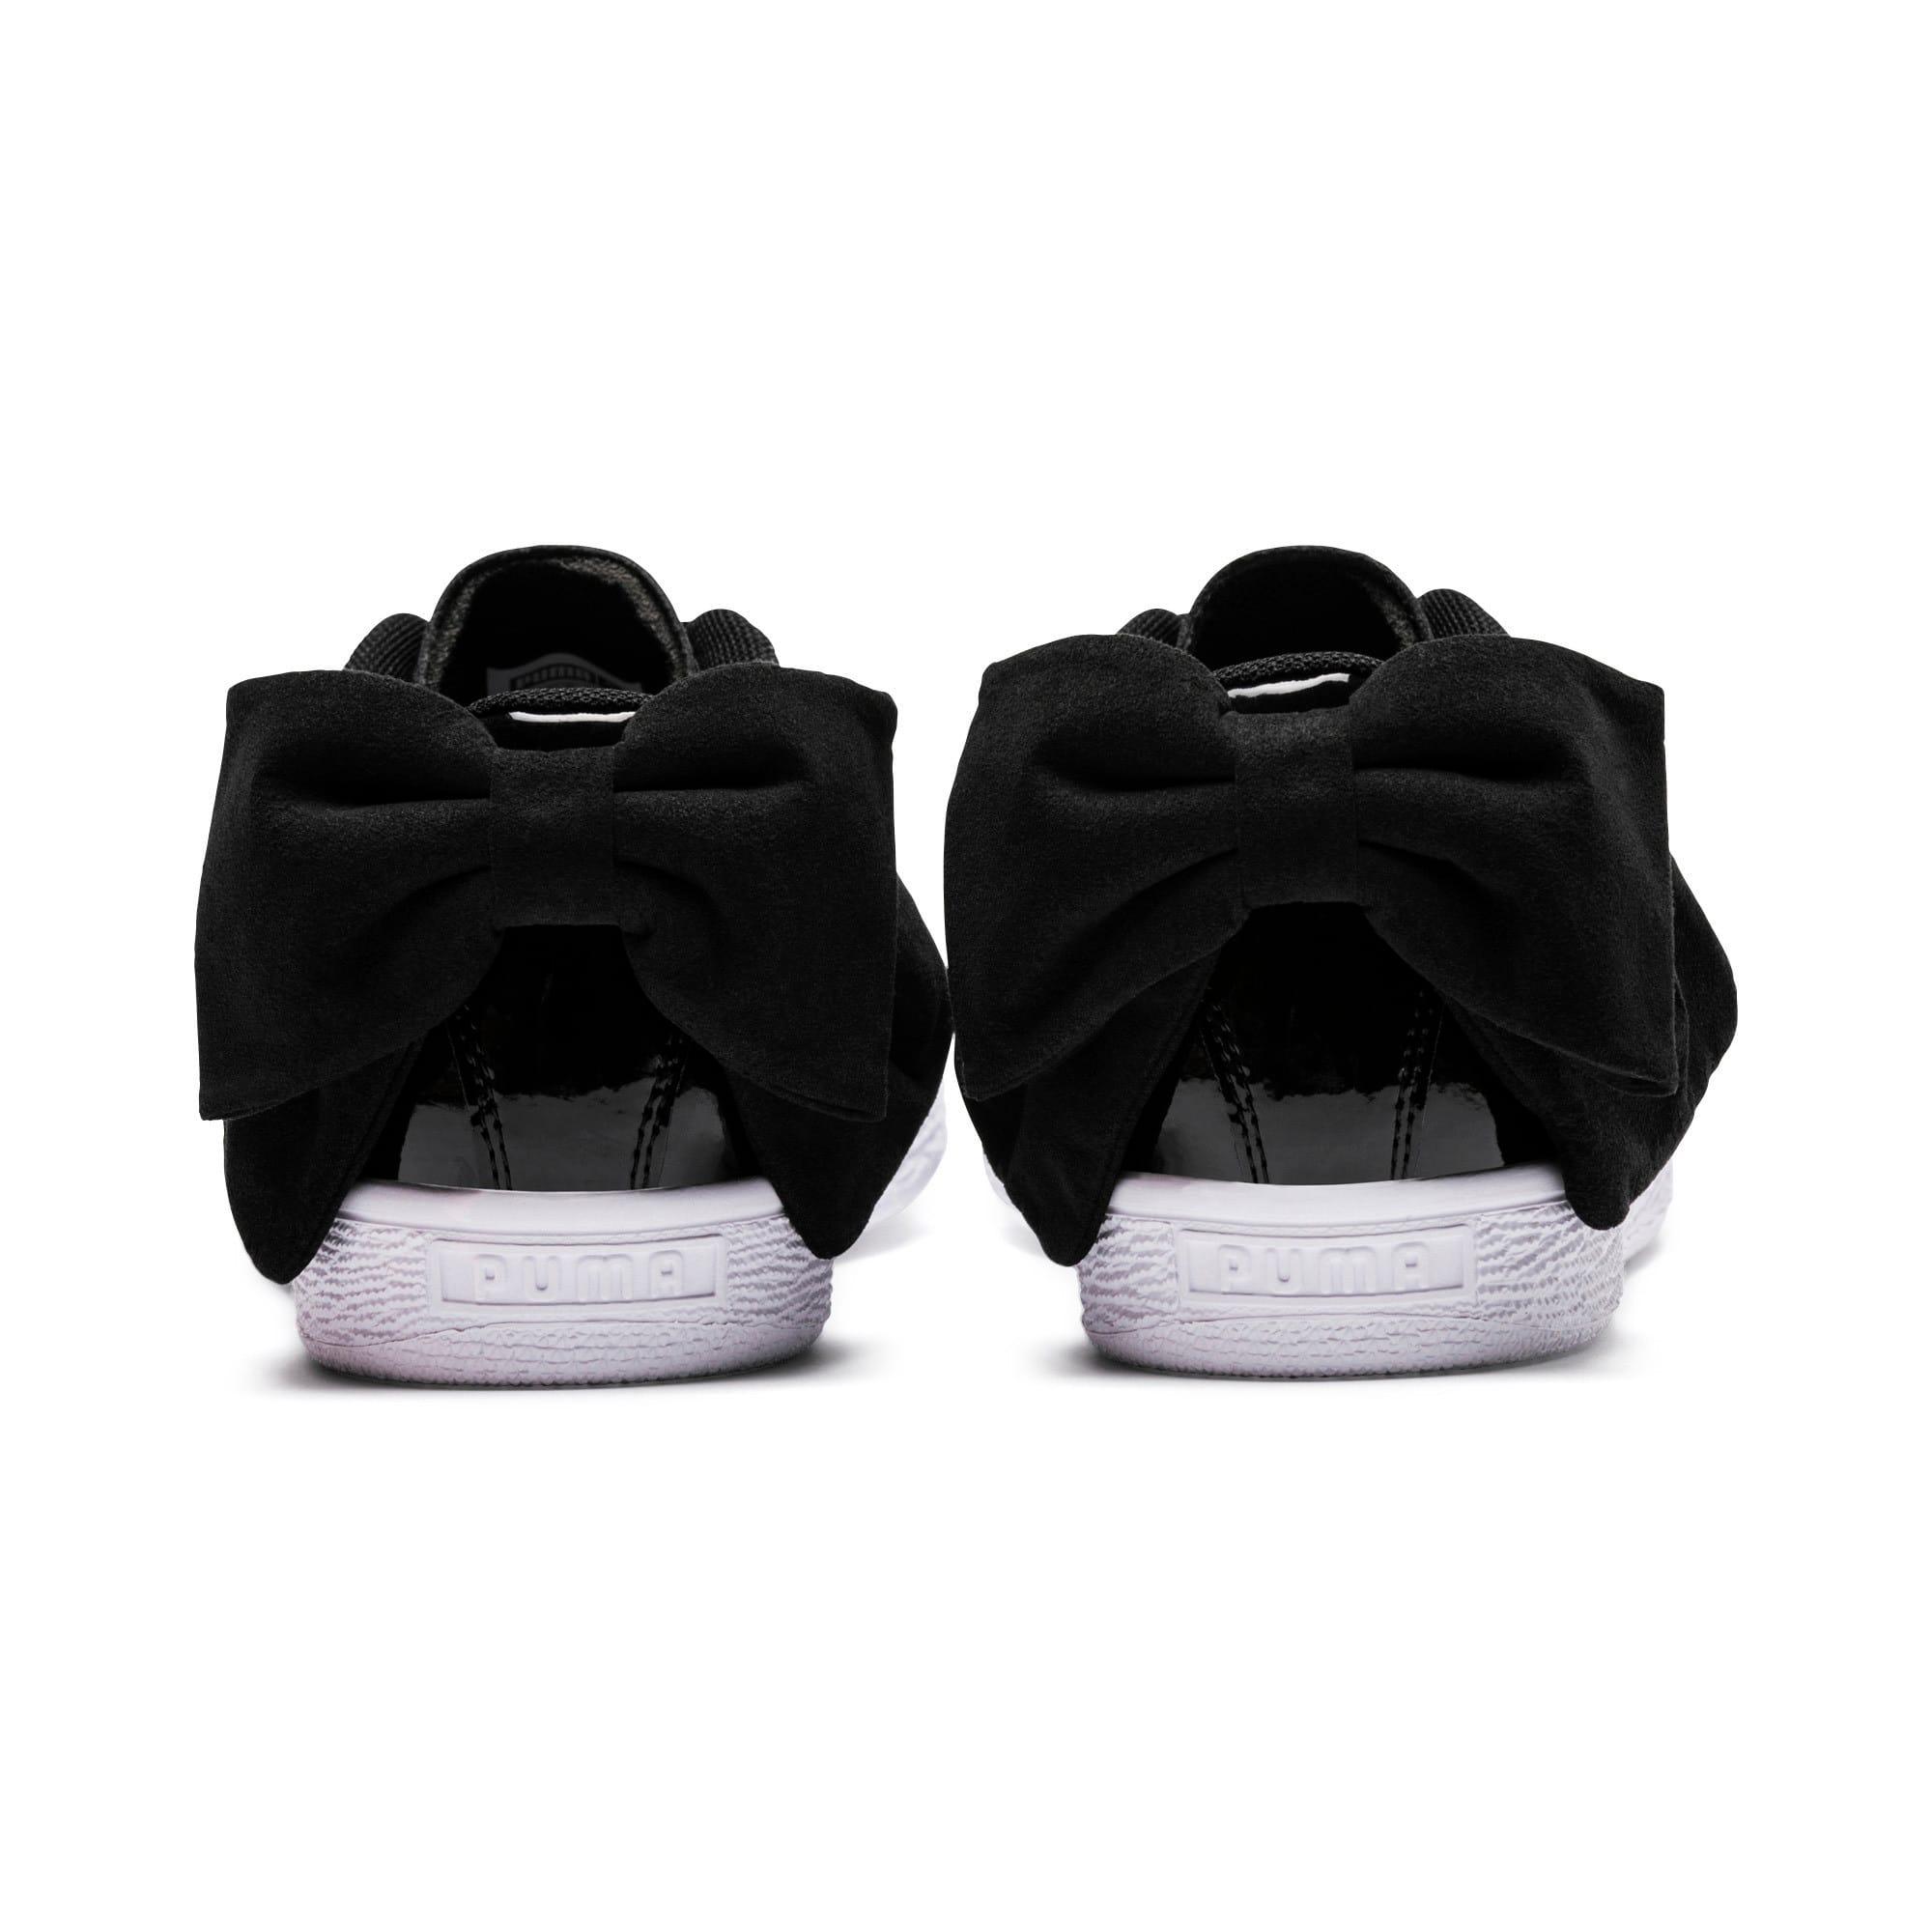 Thumbnail 4 of Basket Suede Bow Women's Sneakers, Puma Black-Puma Black, medium